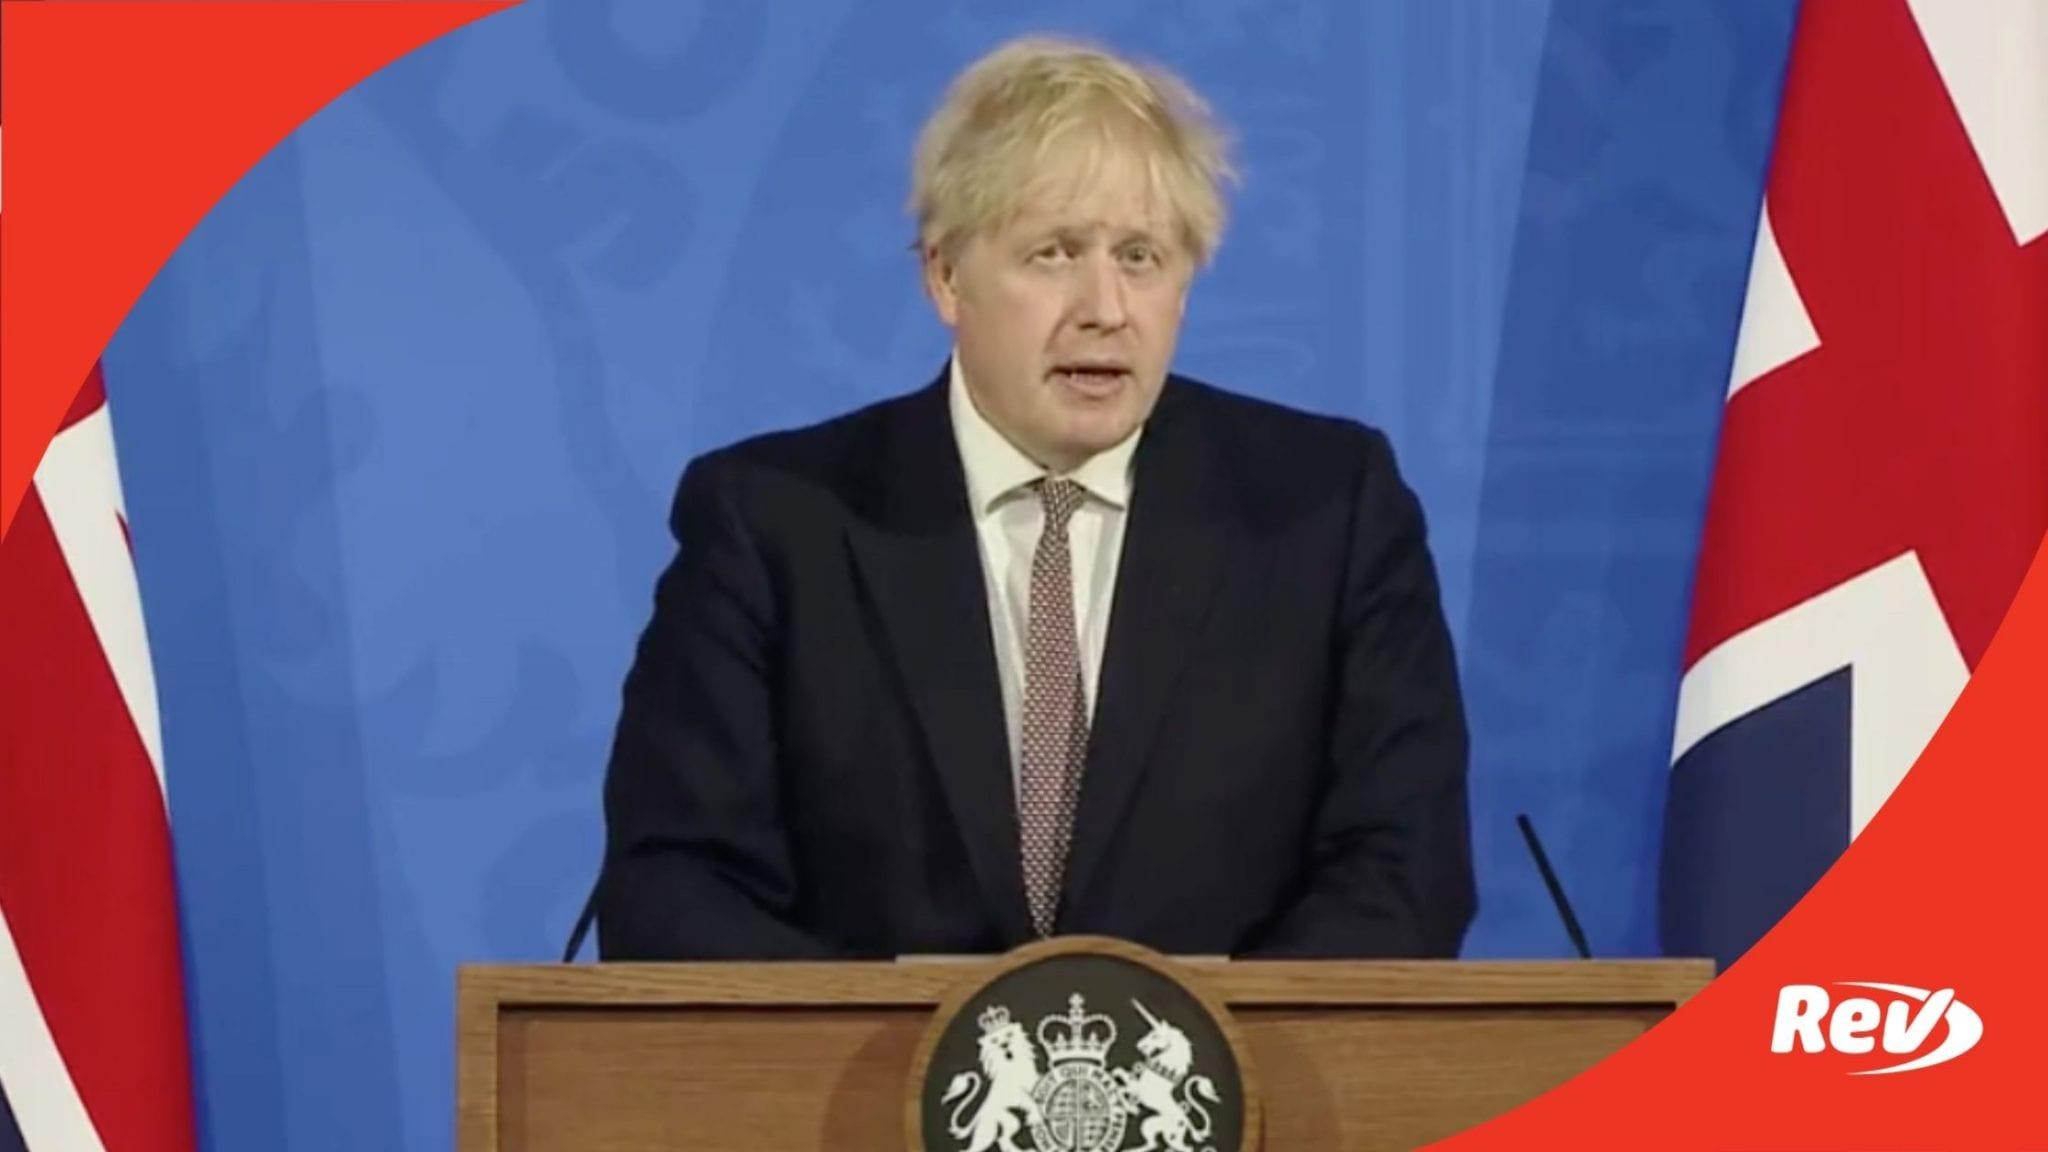 UK Prime Minister Boris Johnson COVID-19 Press Conference Transcript May 10